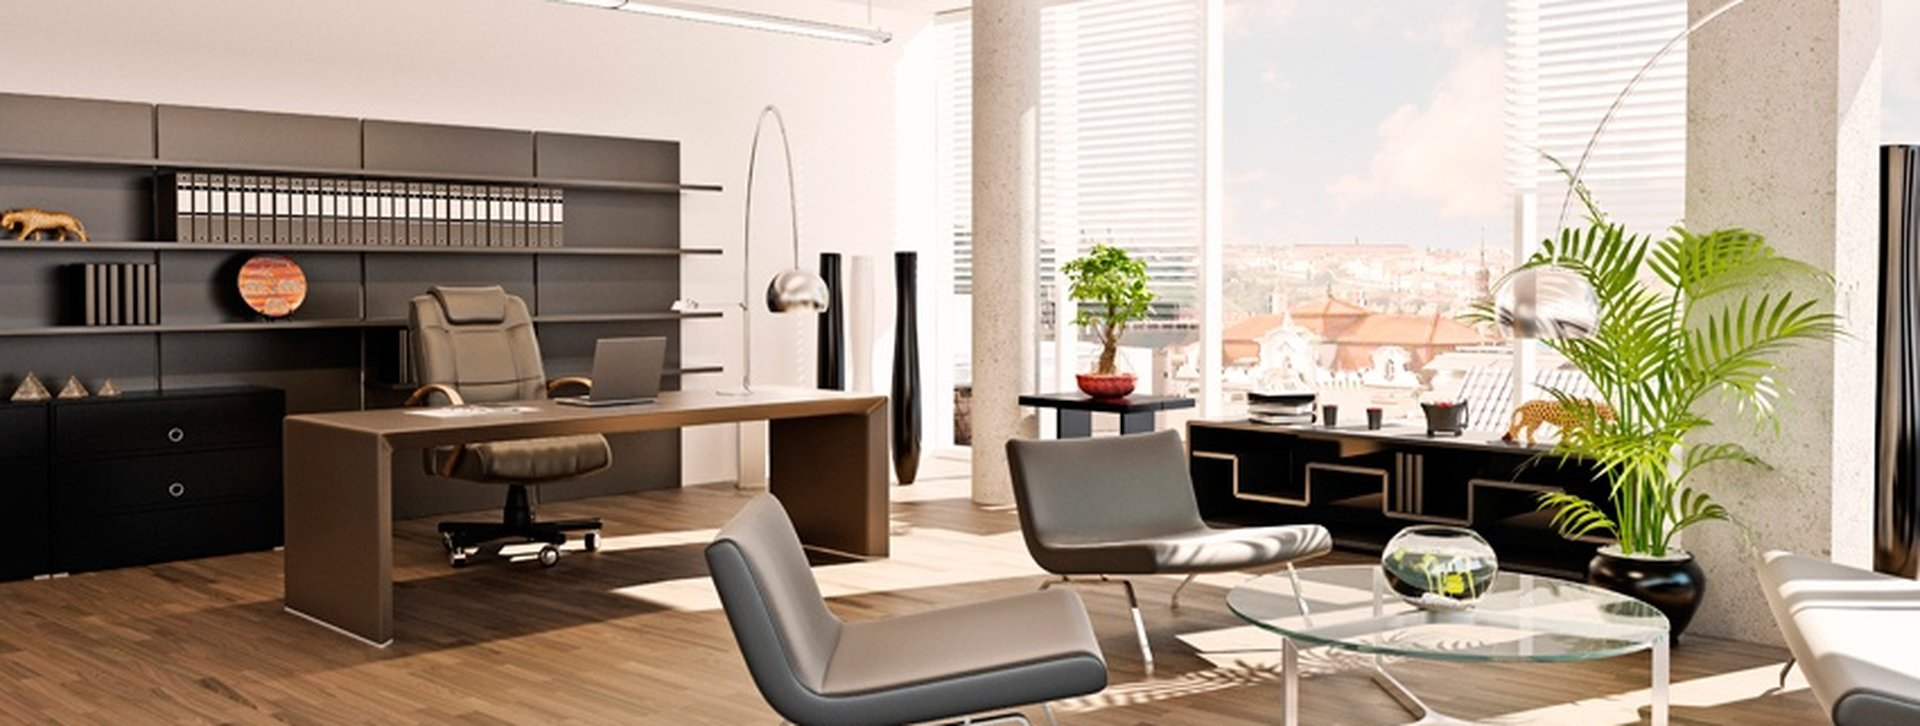 office_interier_02_l_0001_l